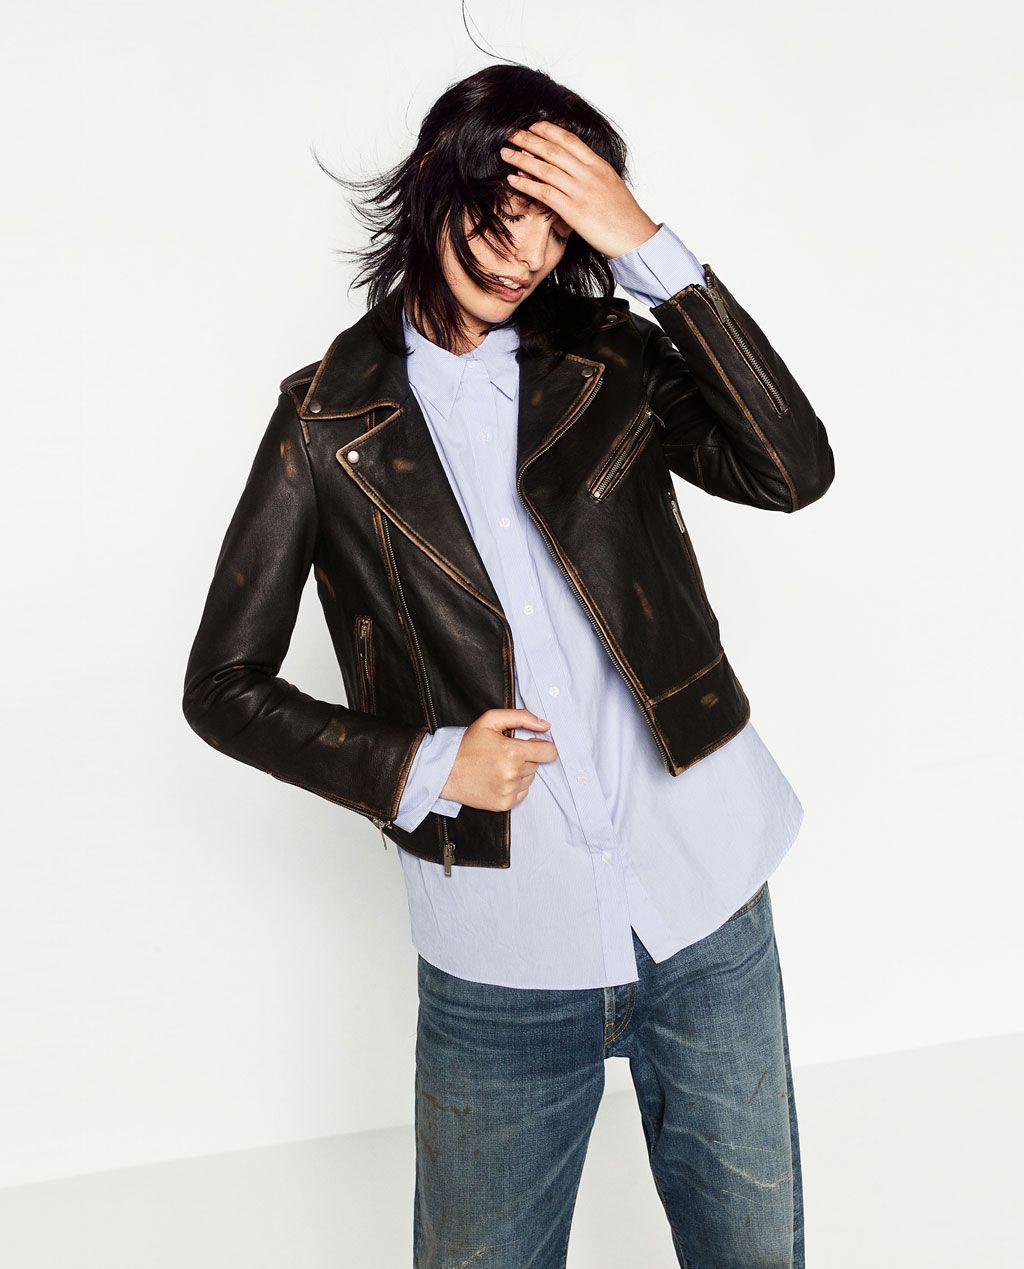 Zara Woman Leather Jacket Distressed Leather Jacket Fashion Leather Jacket [ 1269 x 1024 Pixel ]